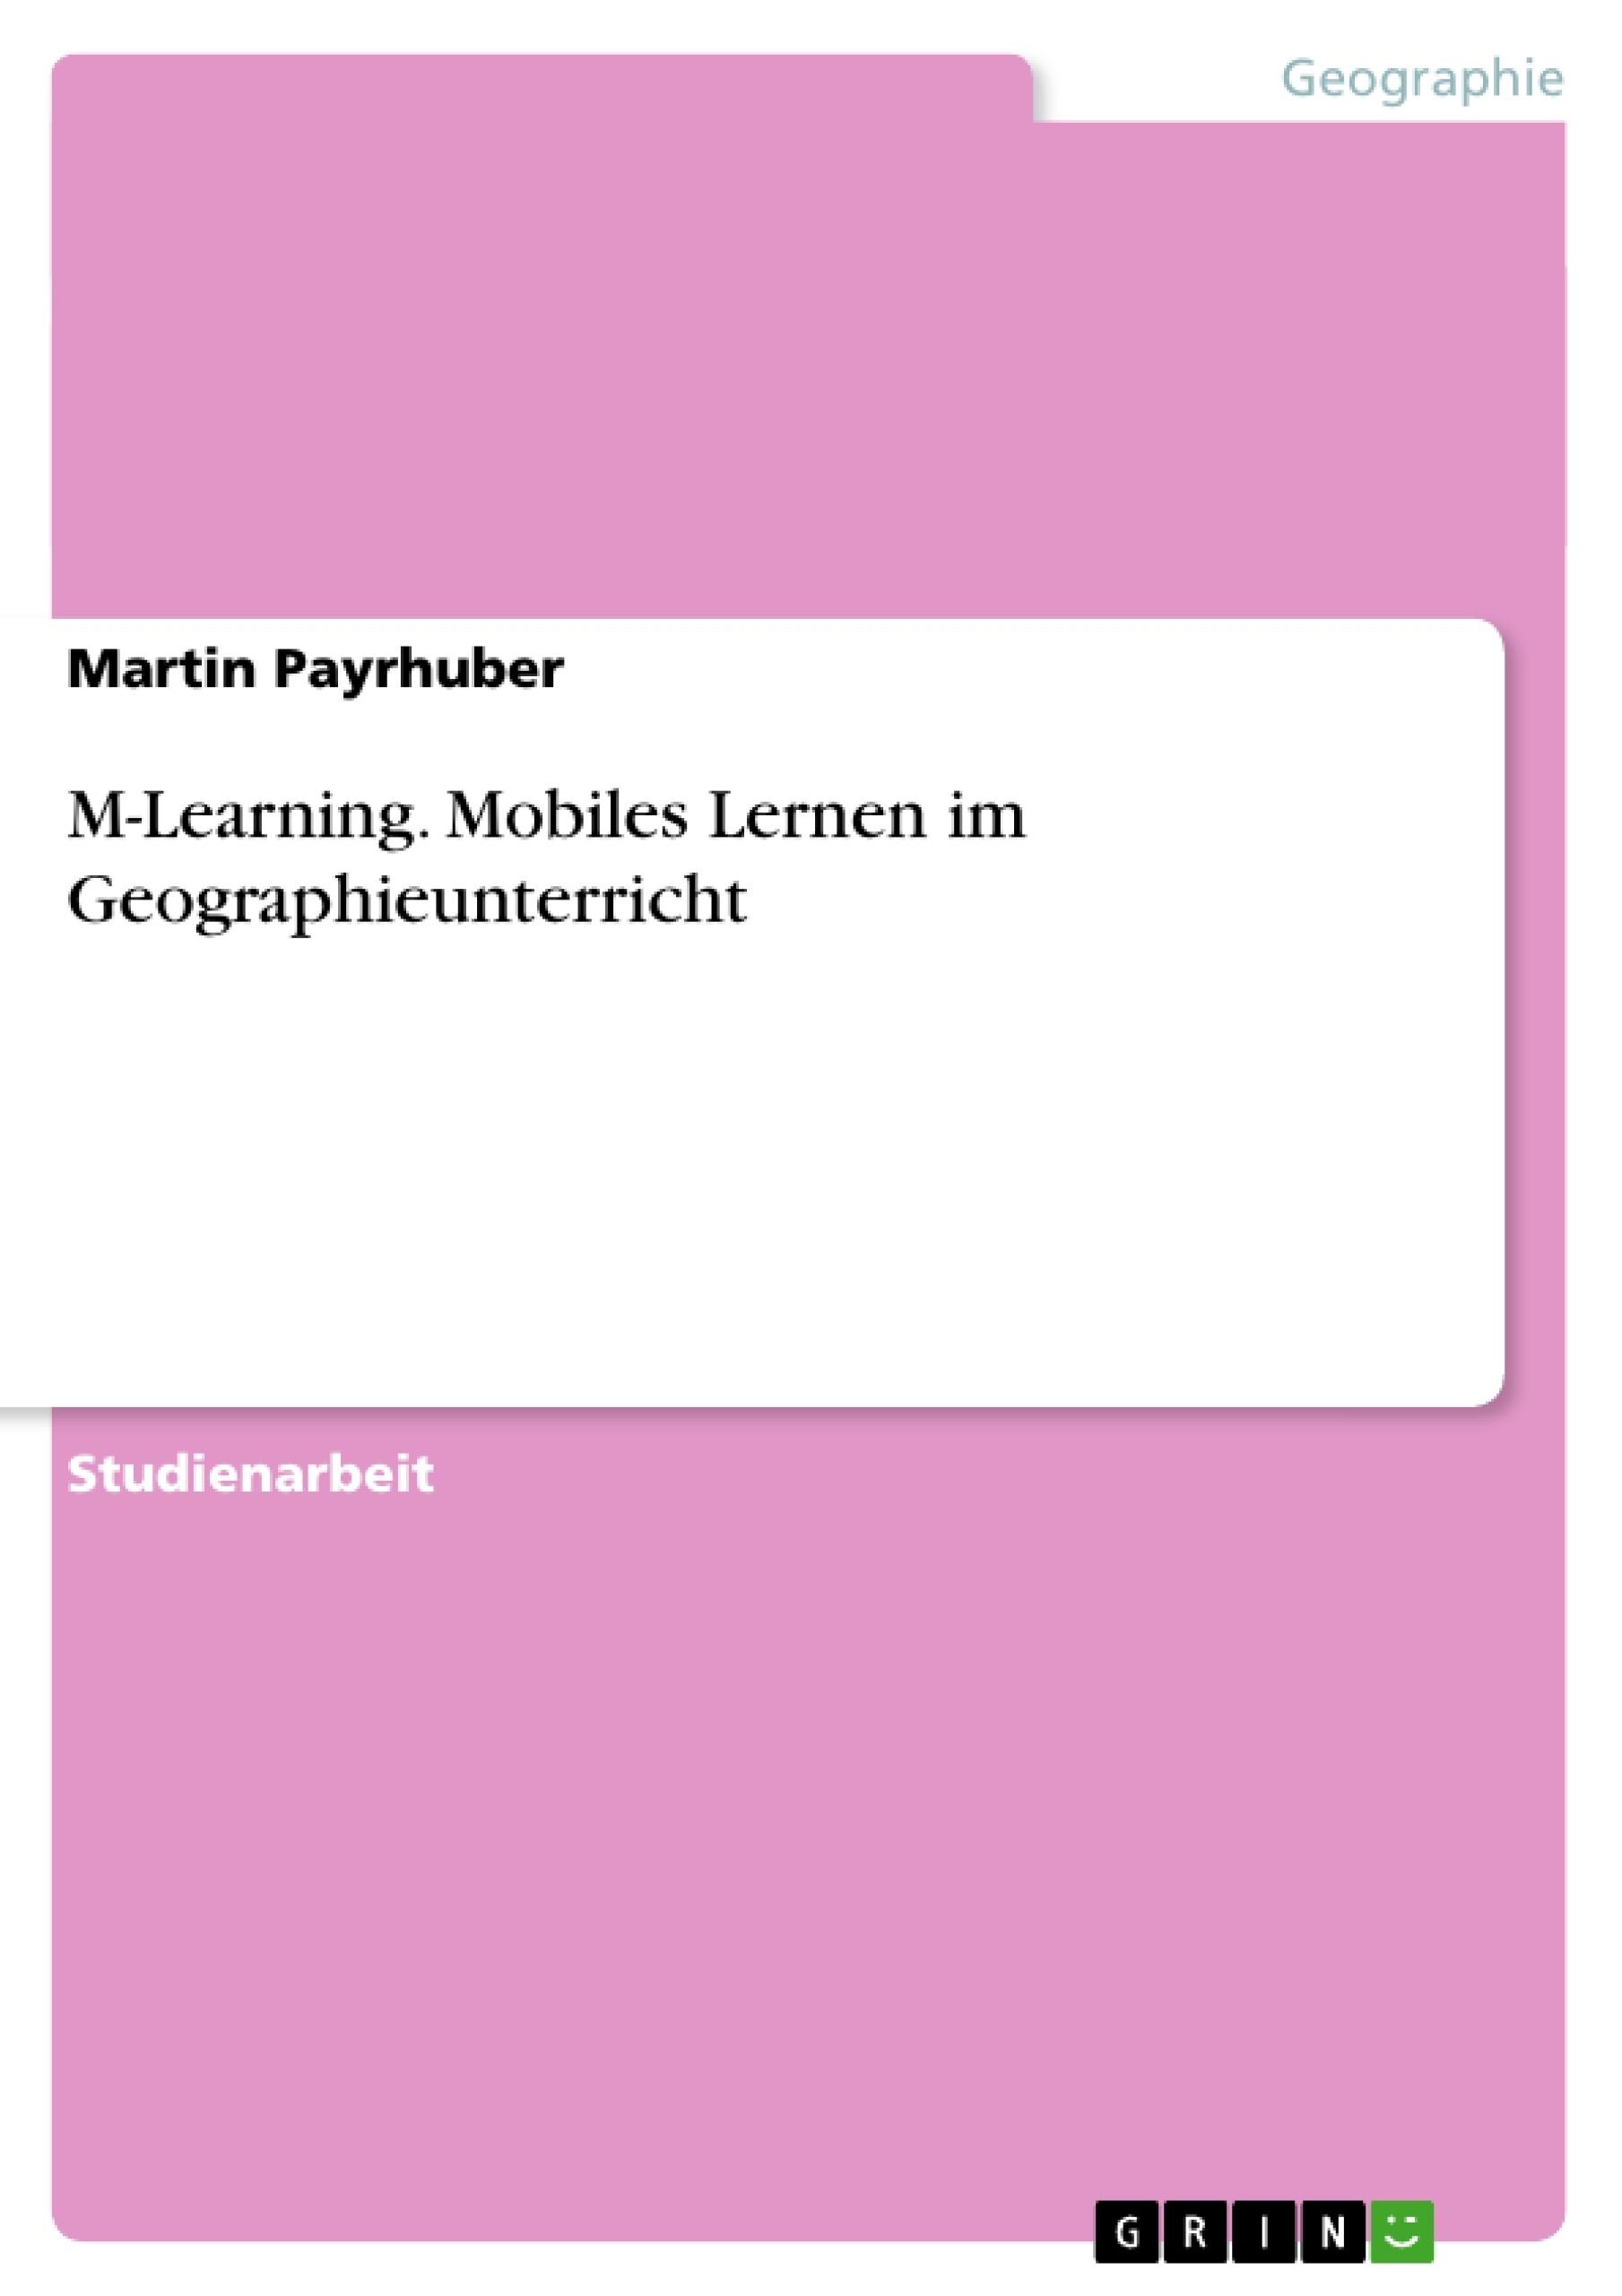 Titel: M-Learning. Mobiles Lernen im Geographieunterricht